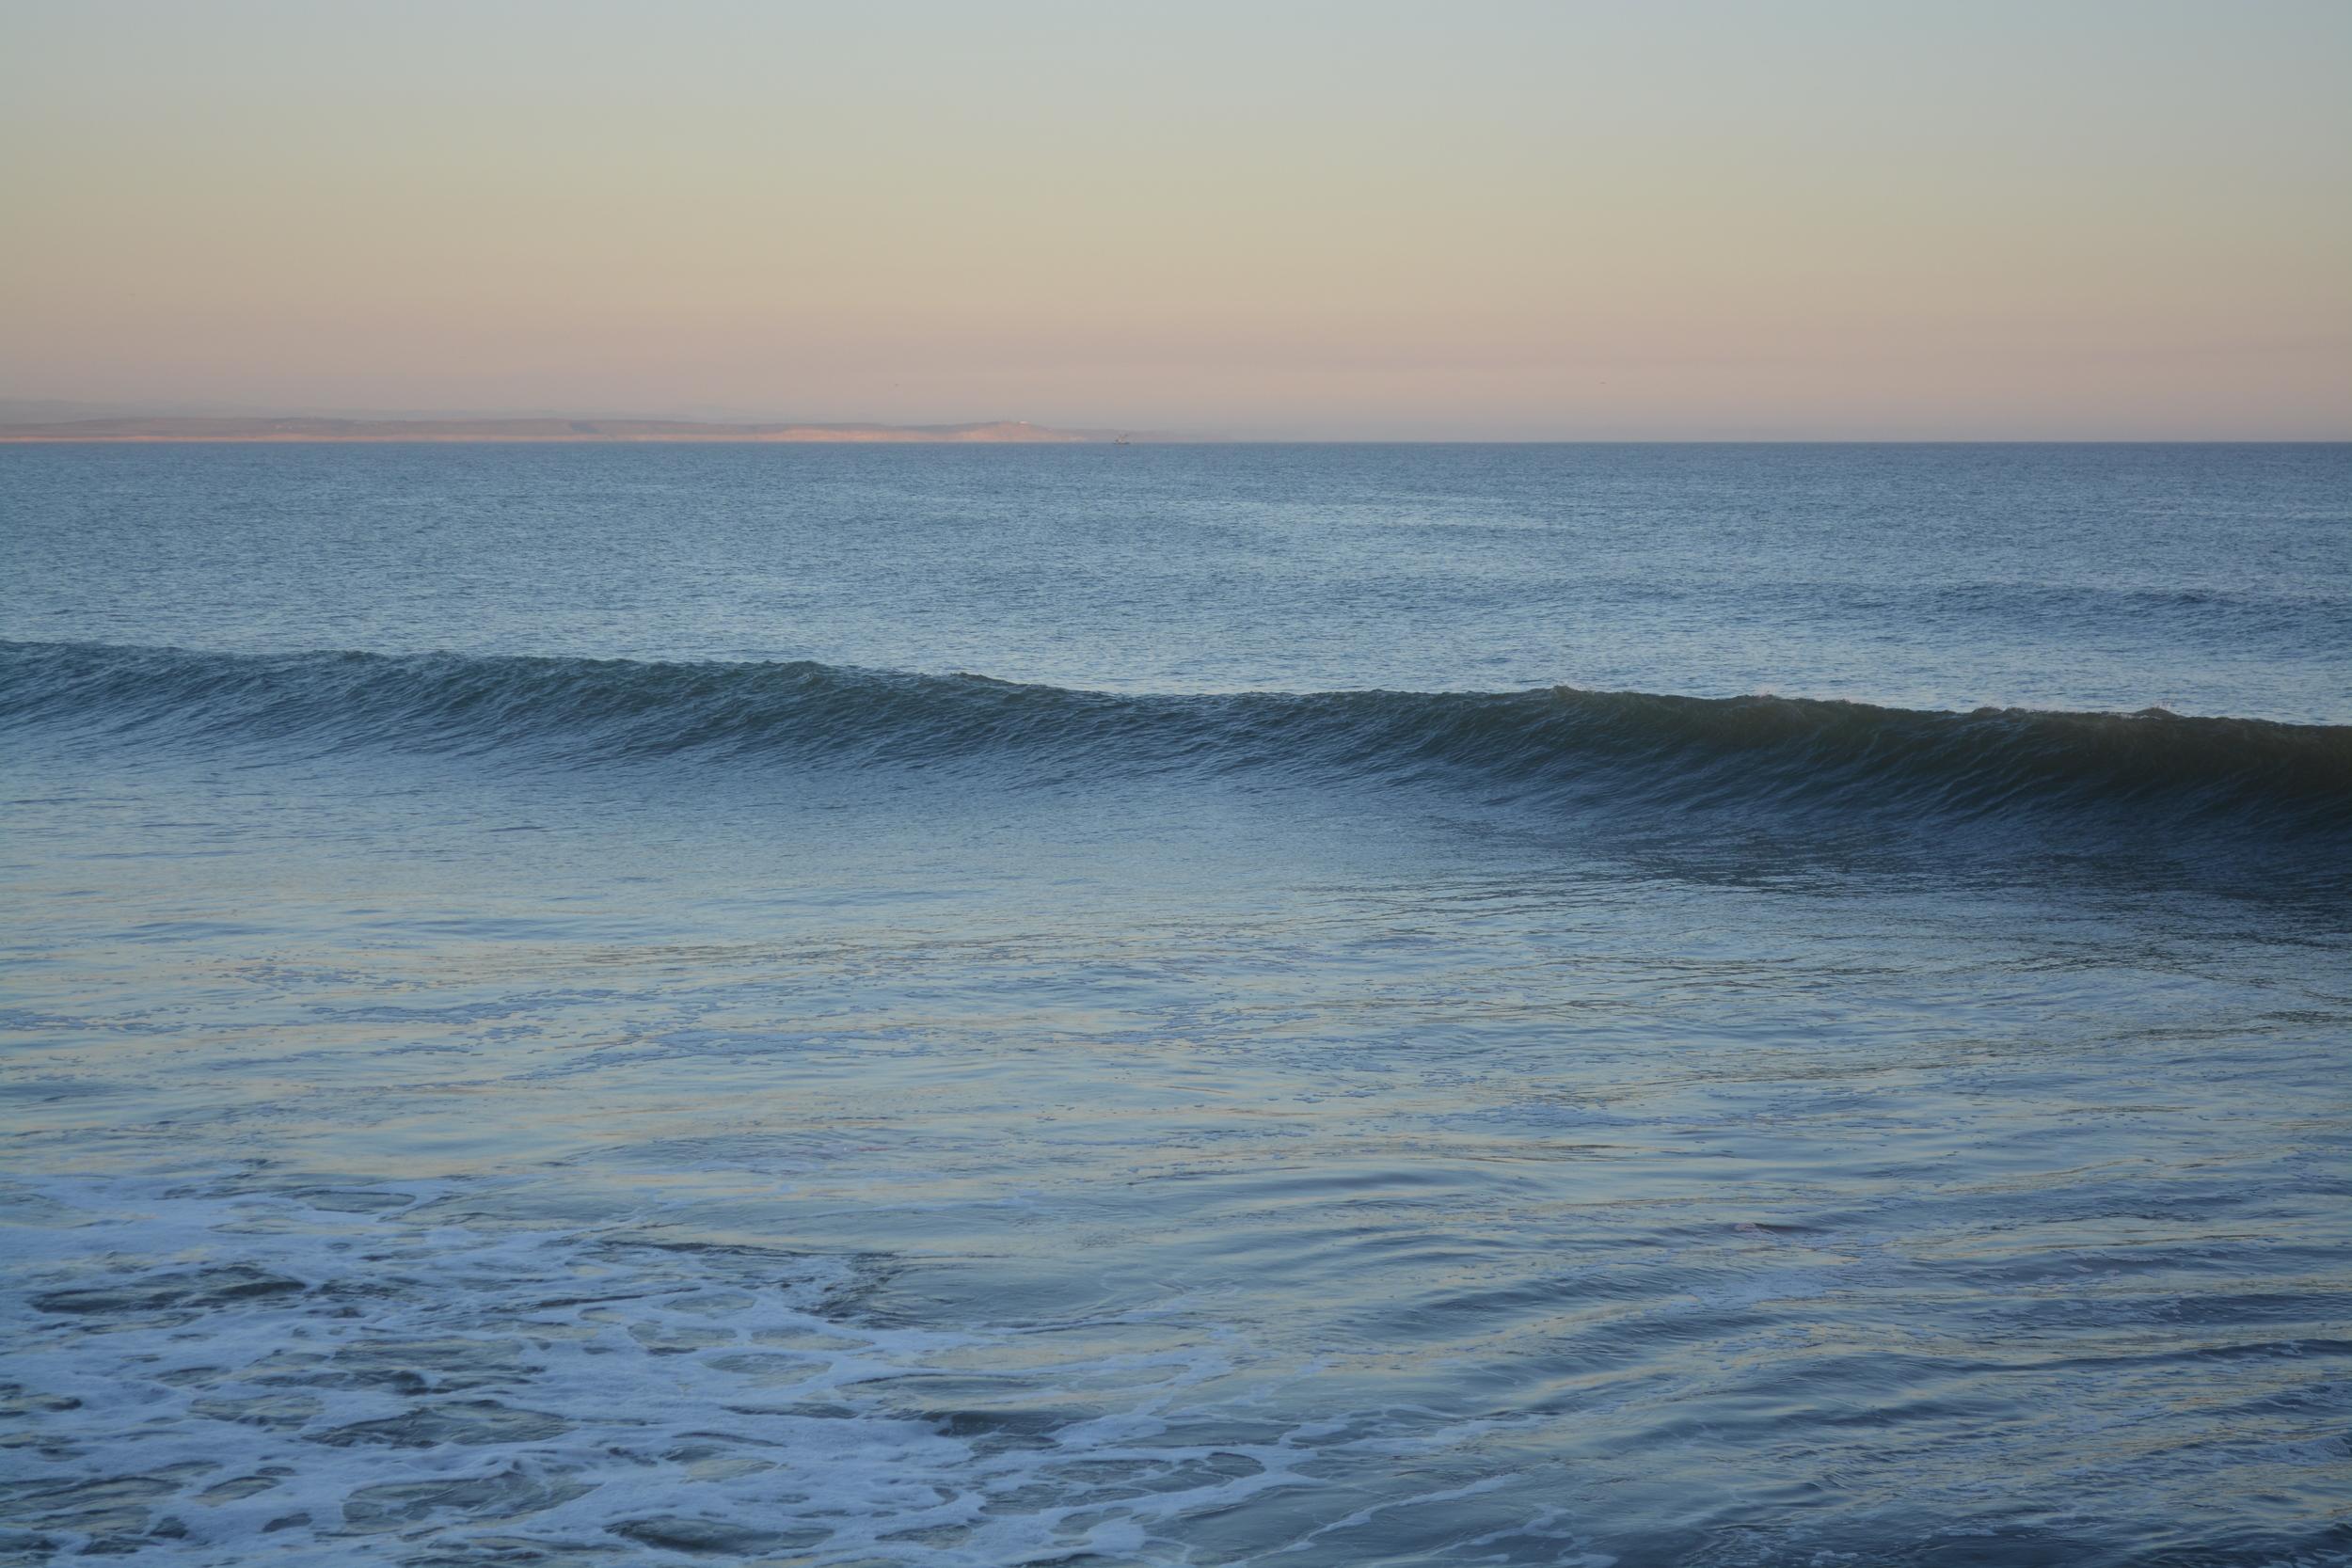 Baja California 10-5-13 Shipwrecks Surfing Adventure Ocean Experience Surf School San Diego (25).JPG